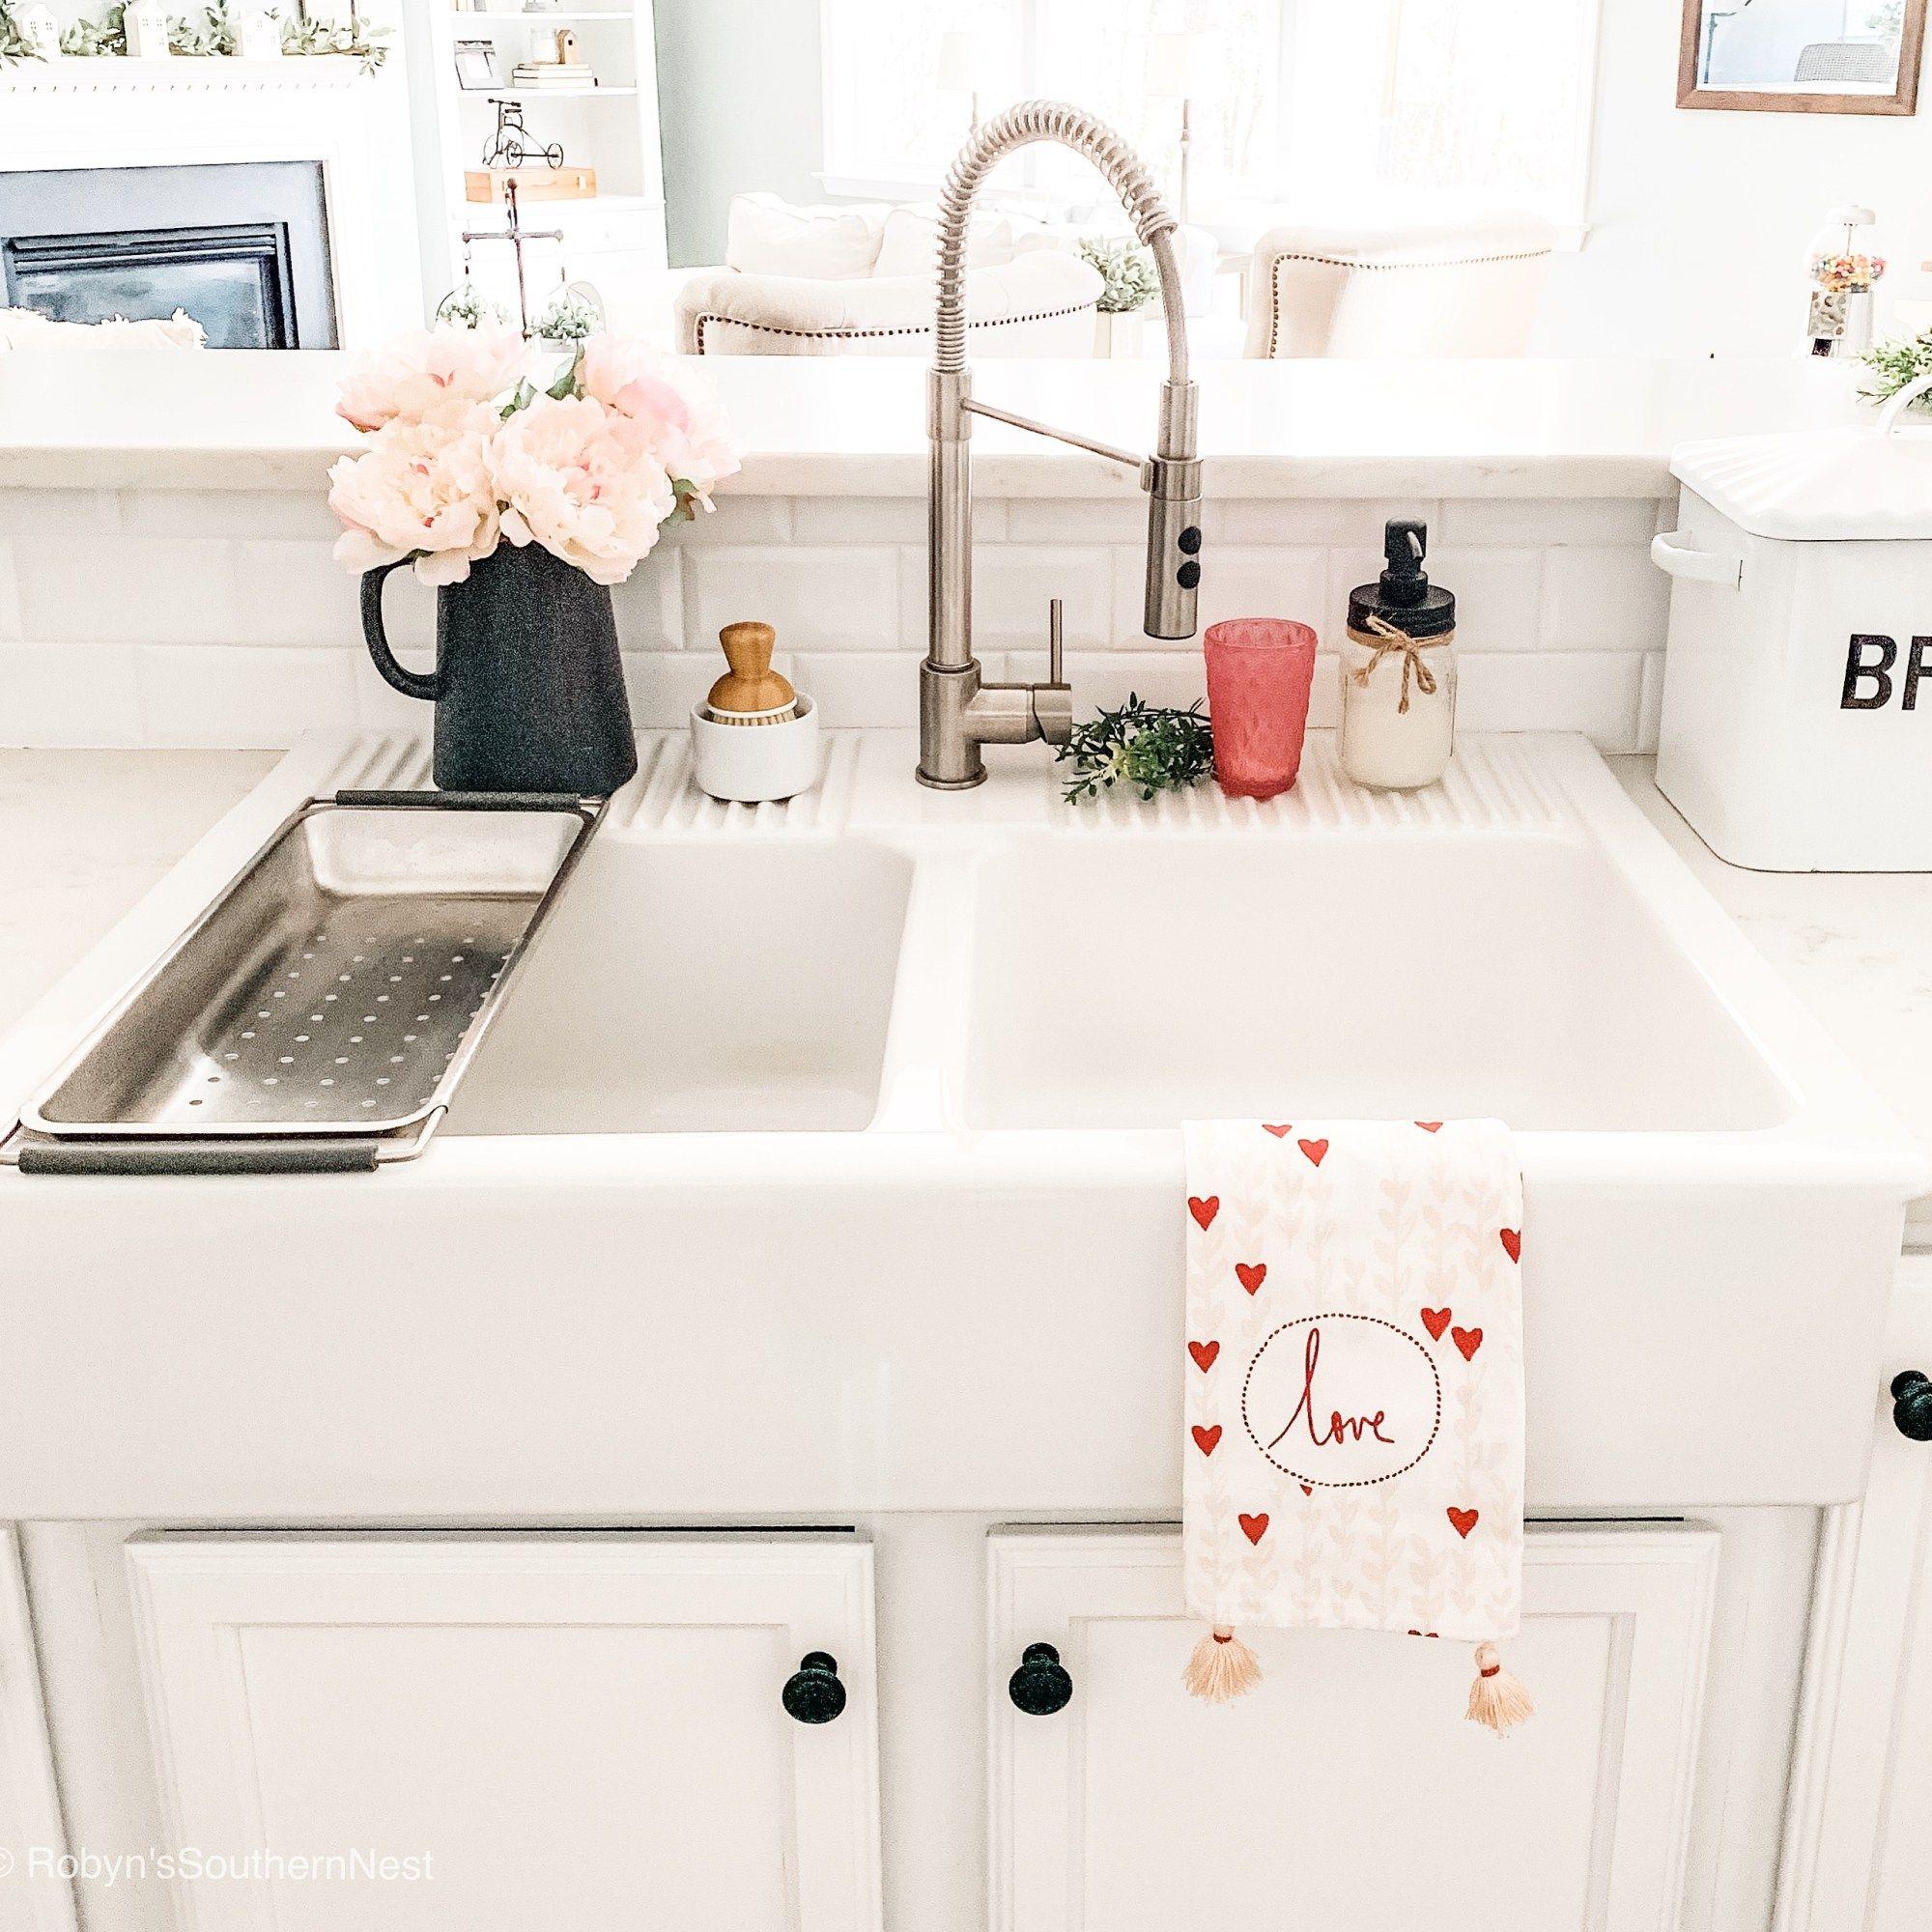 Styling Your Sink Diy kitchen renovation, Diy kitchen